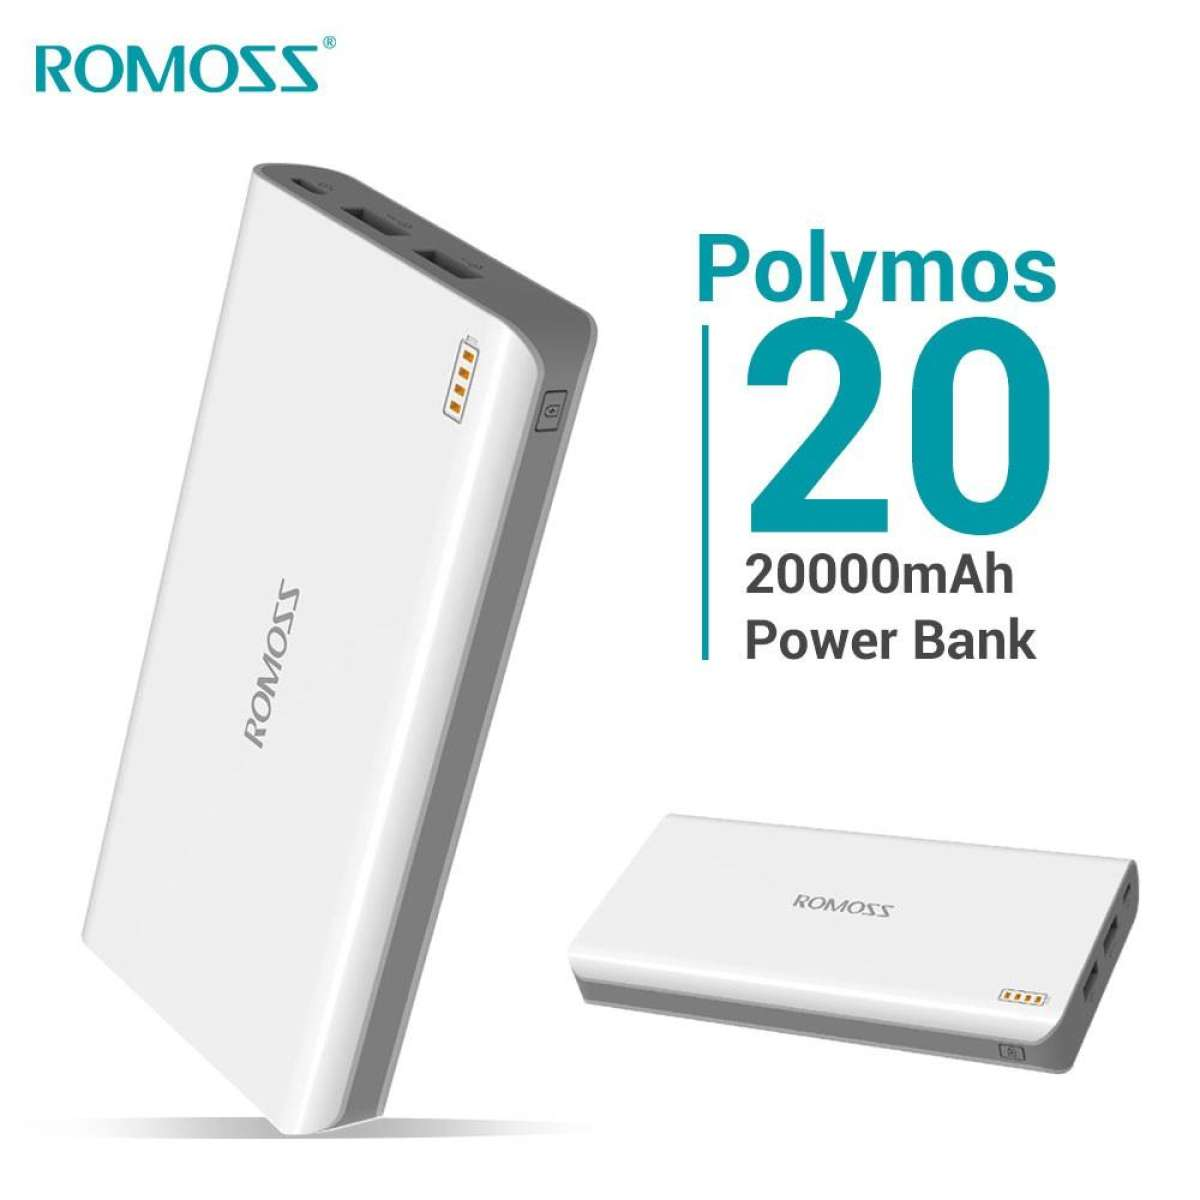 Original ROMOSS Polymos 20 Dual USB 20000mAh Gallery Image 2